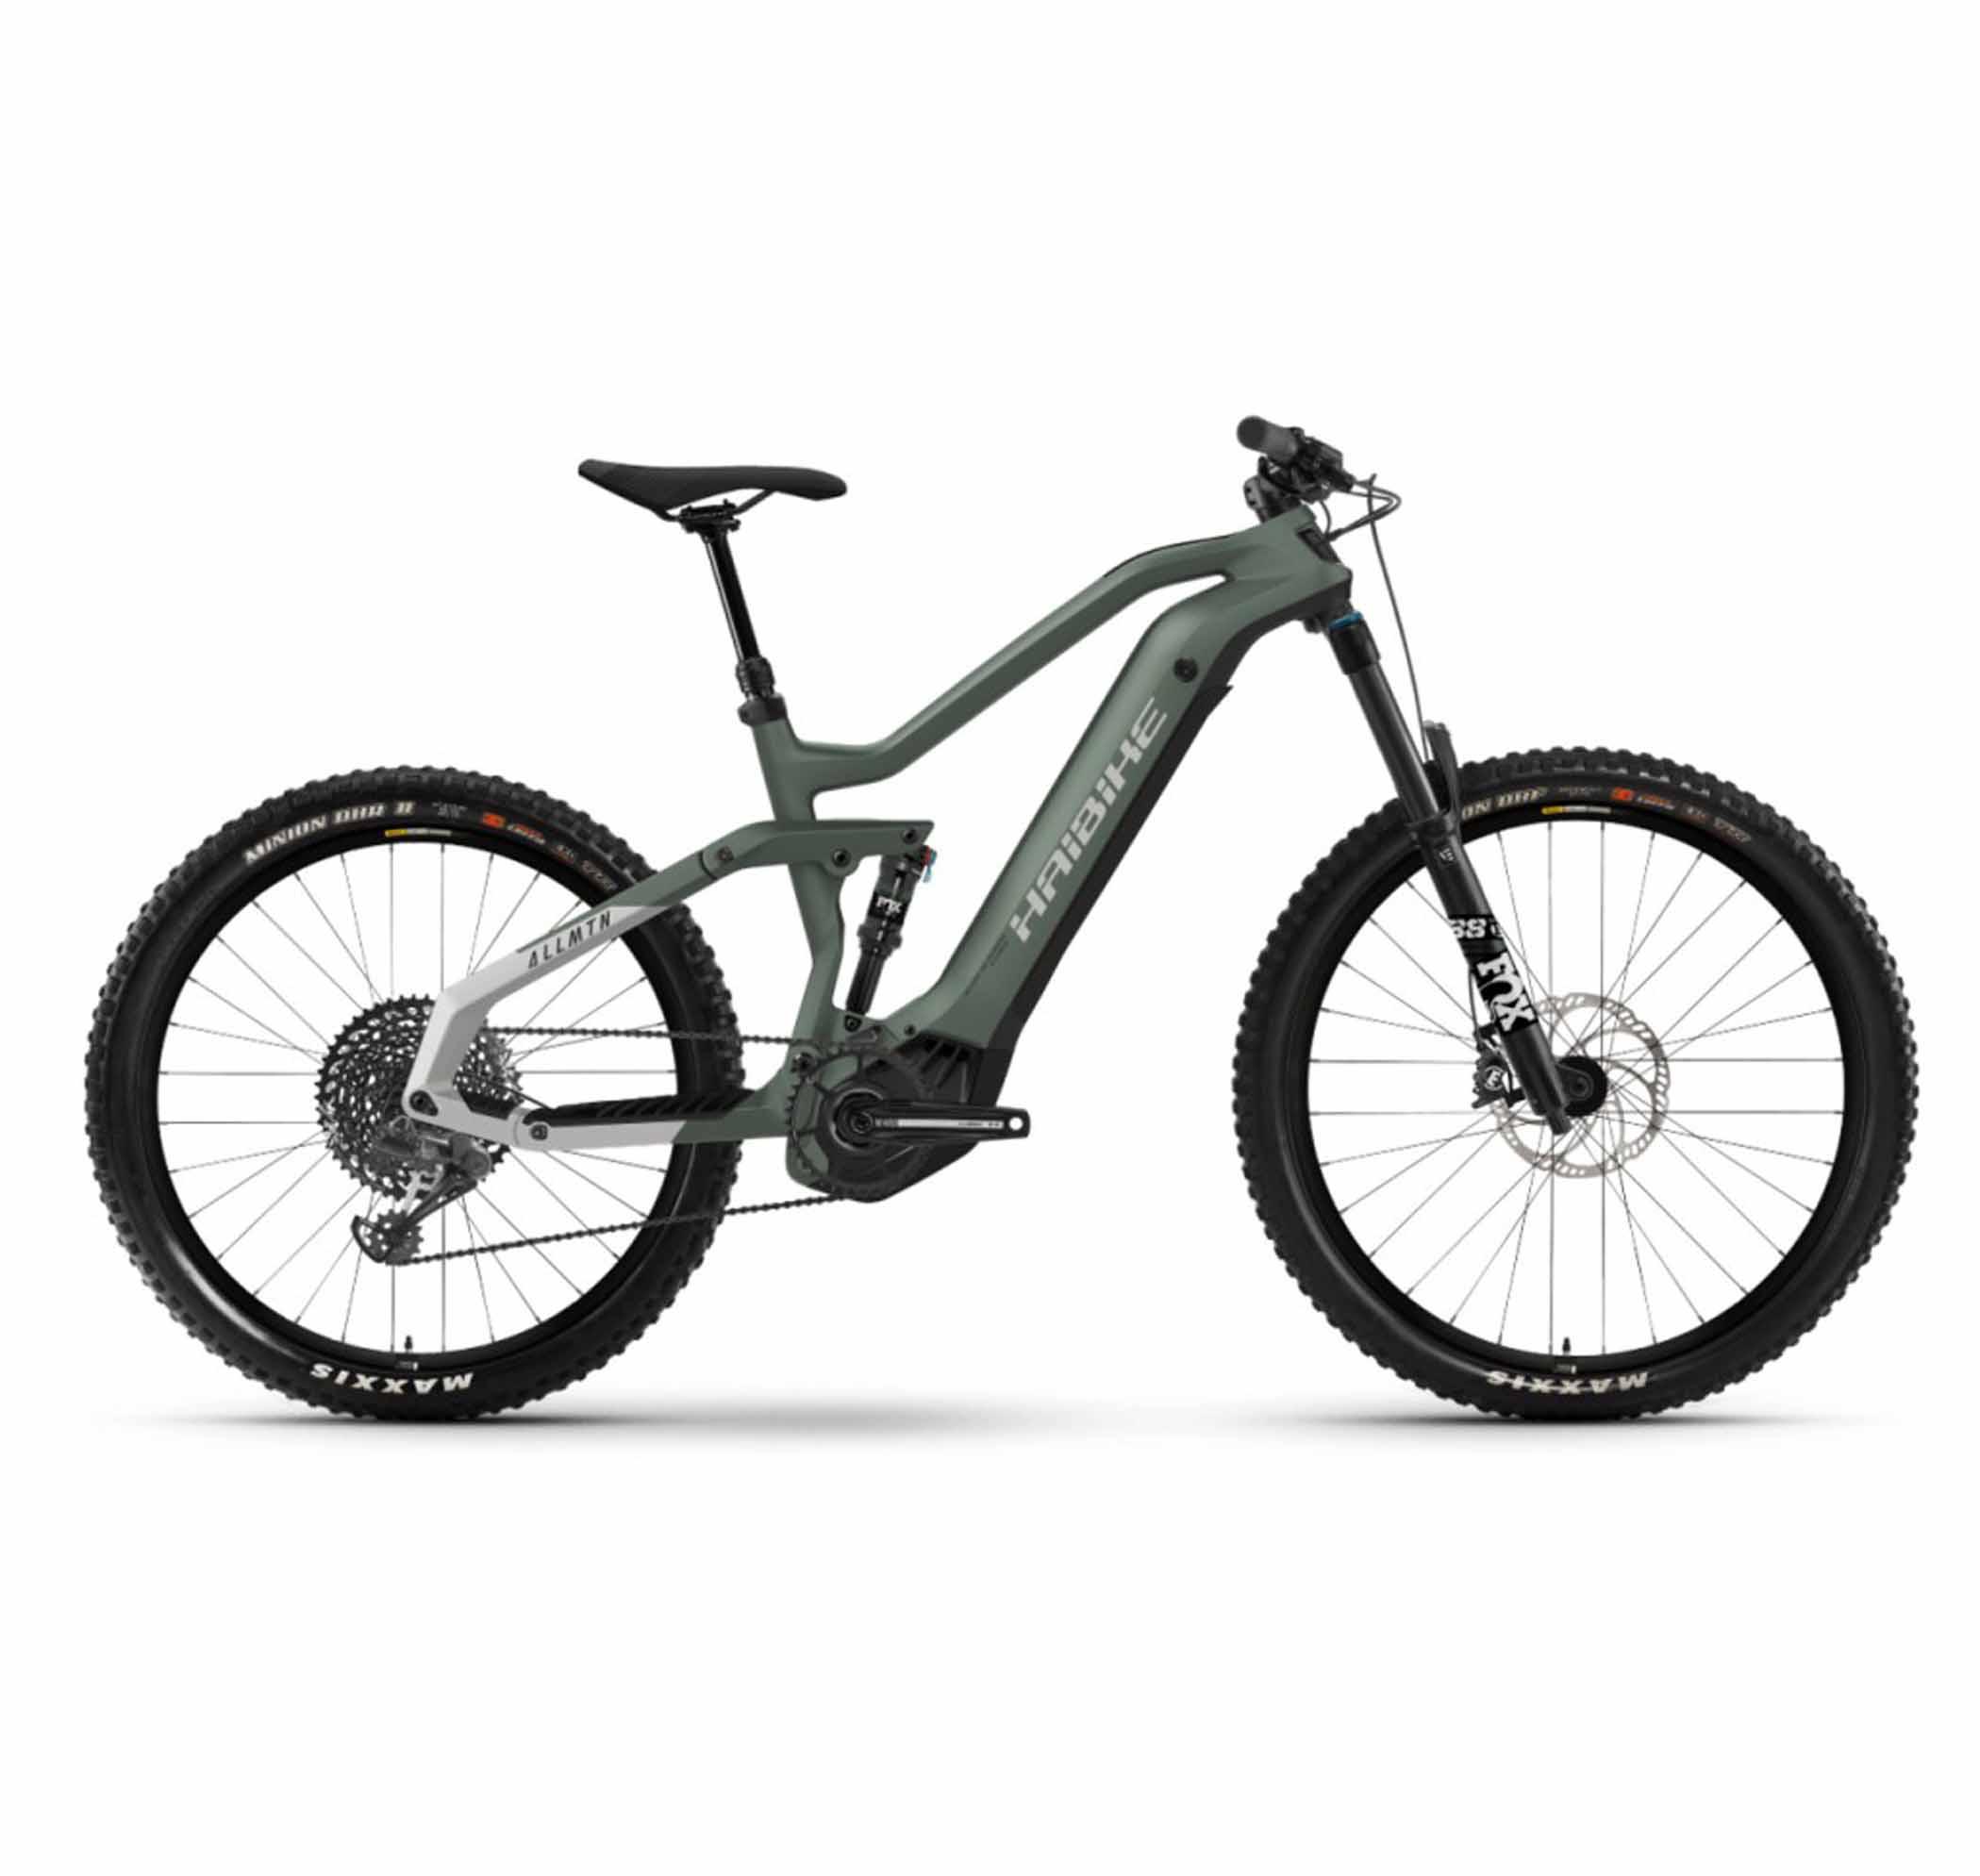 Haibike_Rodeo_Bike_Yamaha_Allmtn_6_i600WH_Bamboo_Green